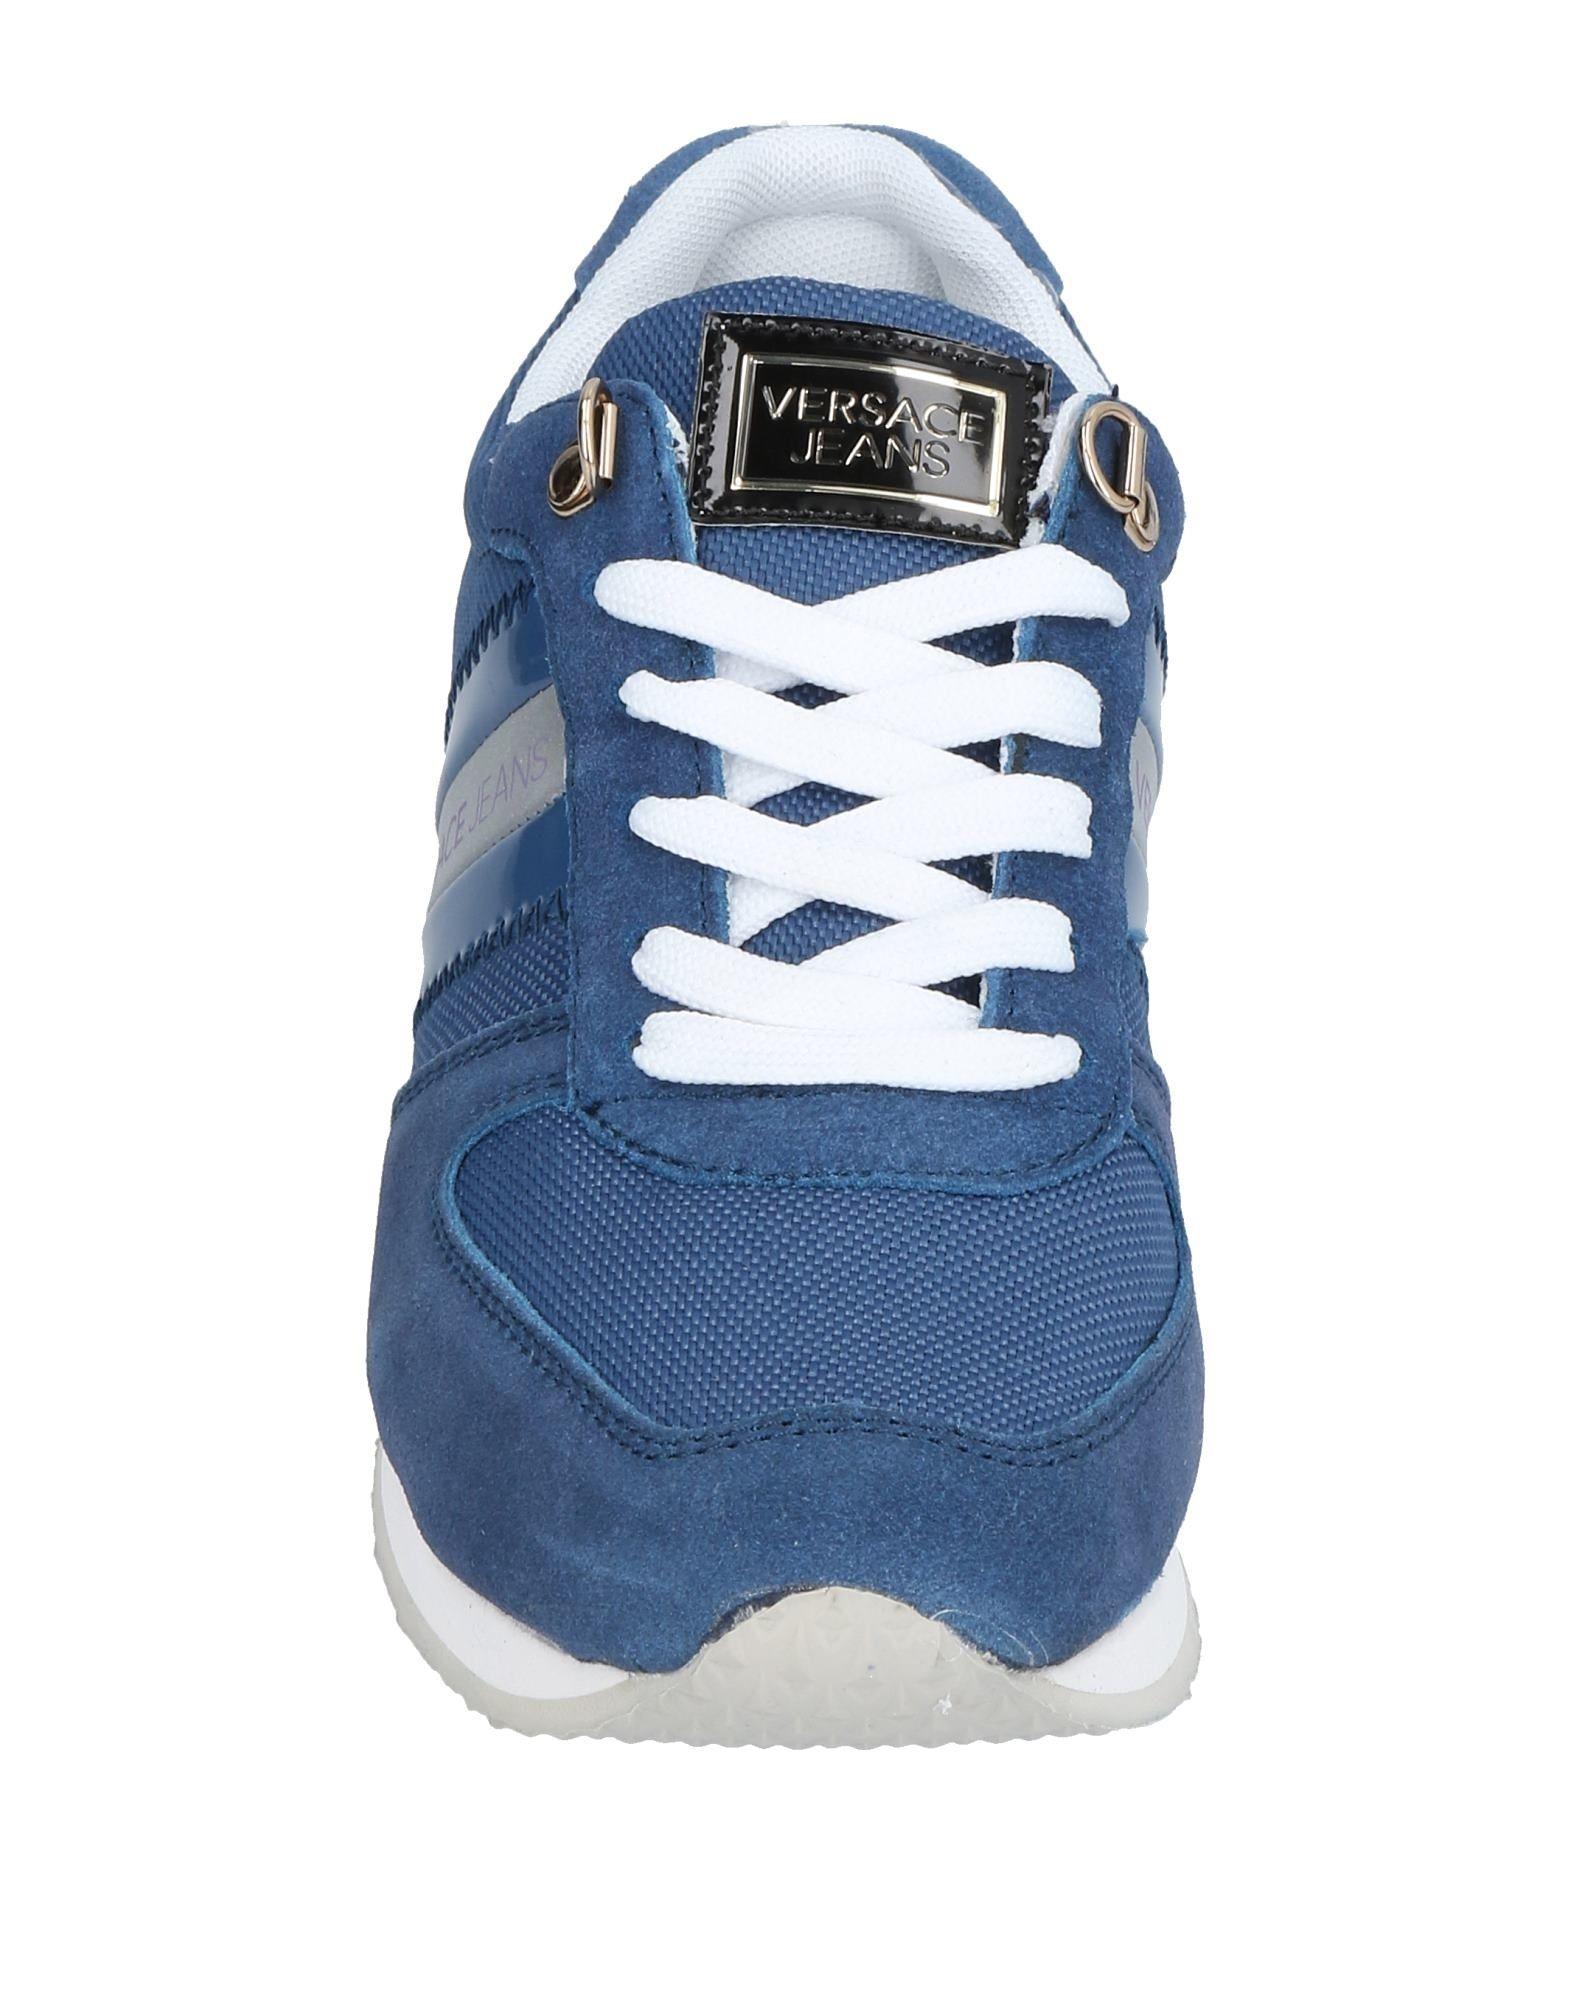 Versace Jeans Sneakers  Damen  Sneakers 11453419CS Neue Schuhe 8019a3